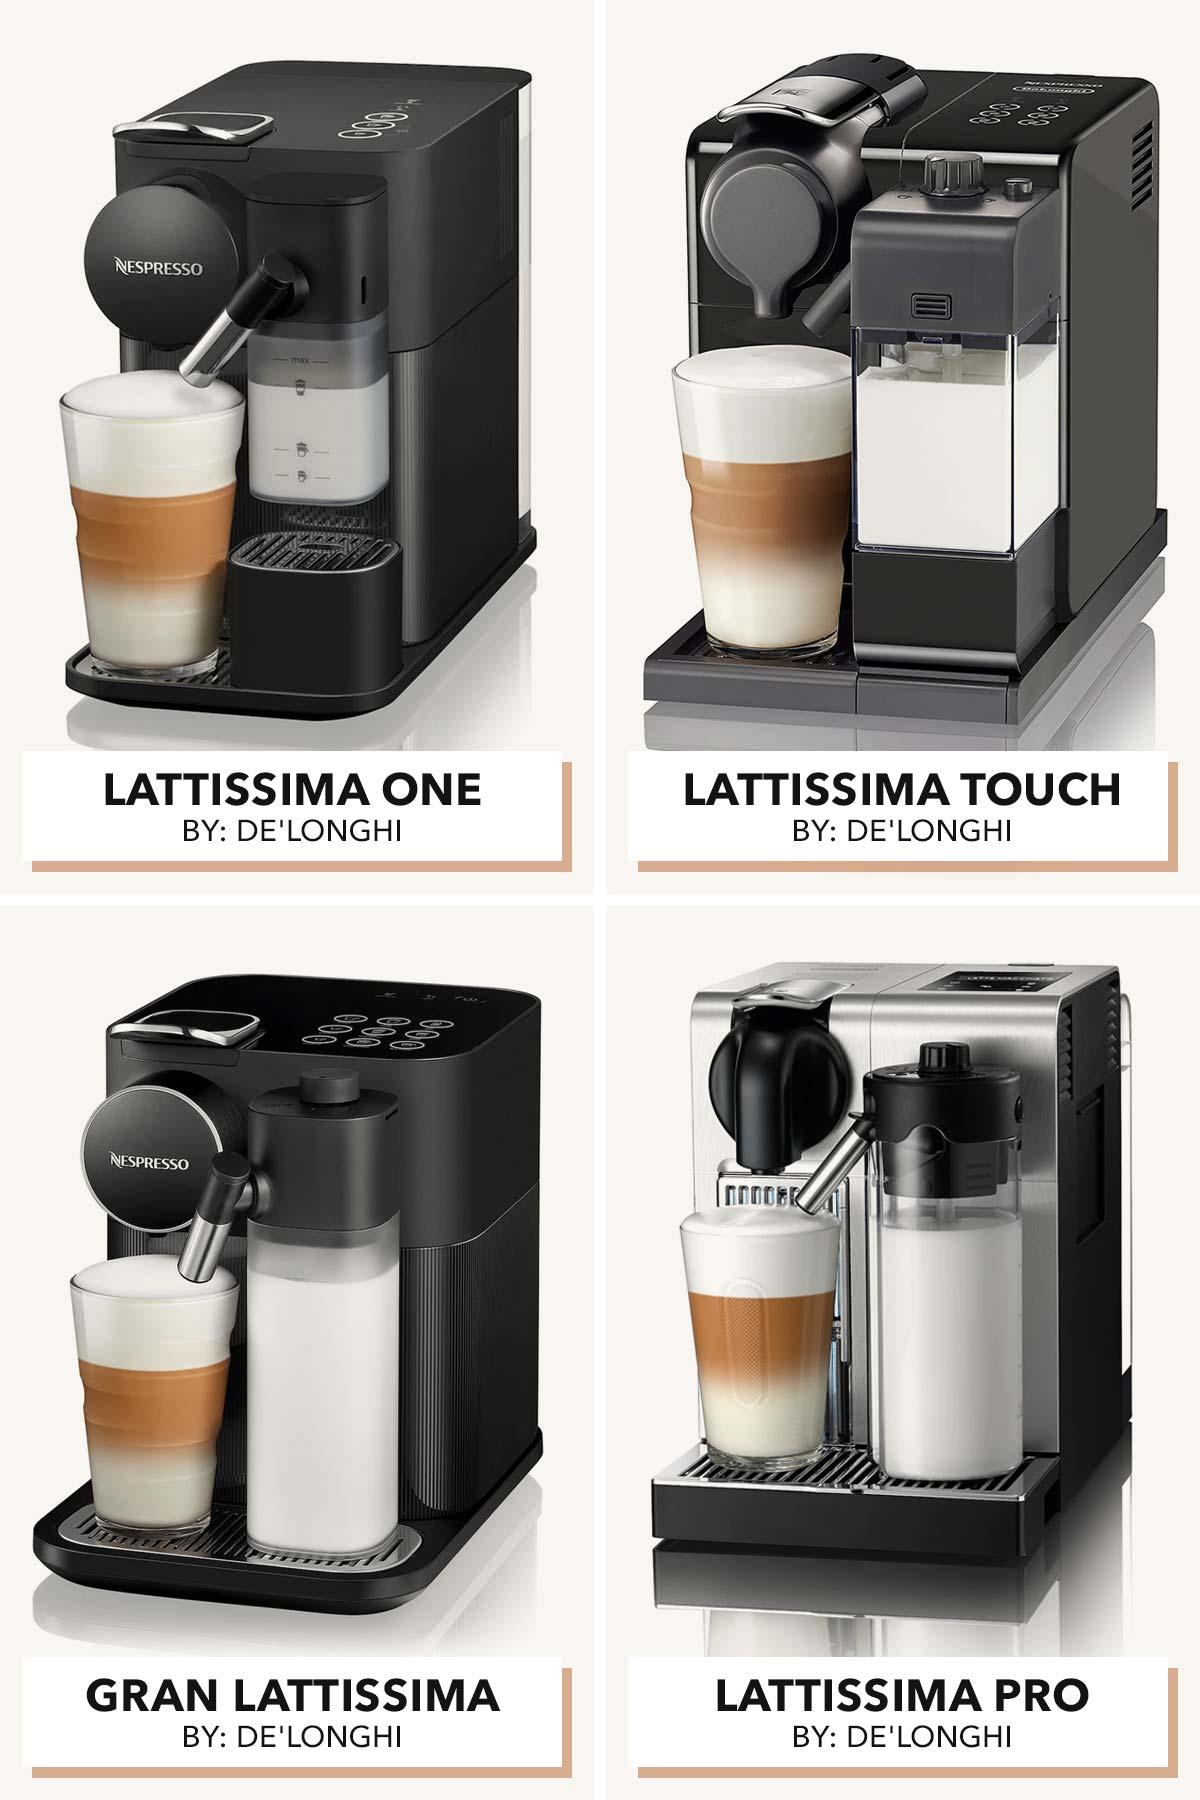 Four photo collage of Nespresso Lattissima models.